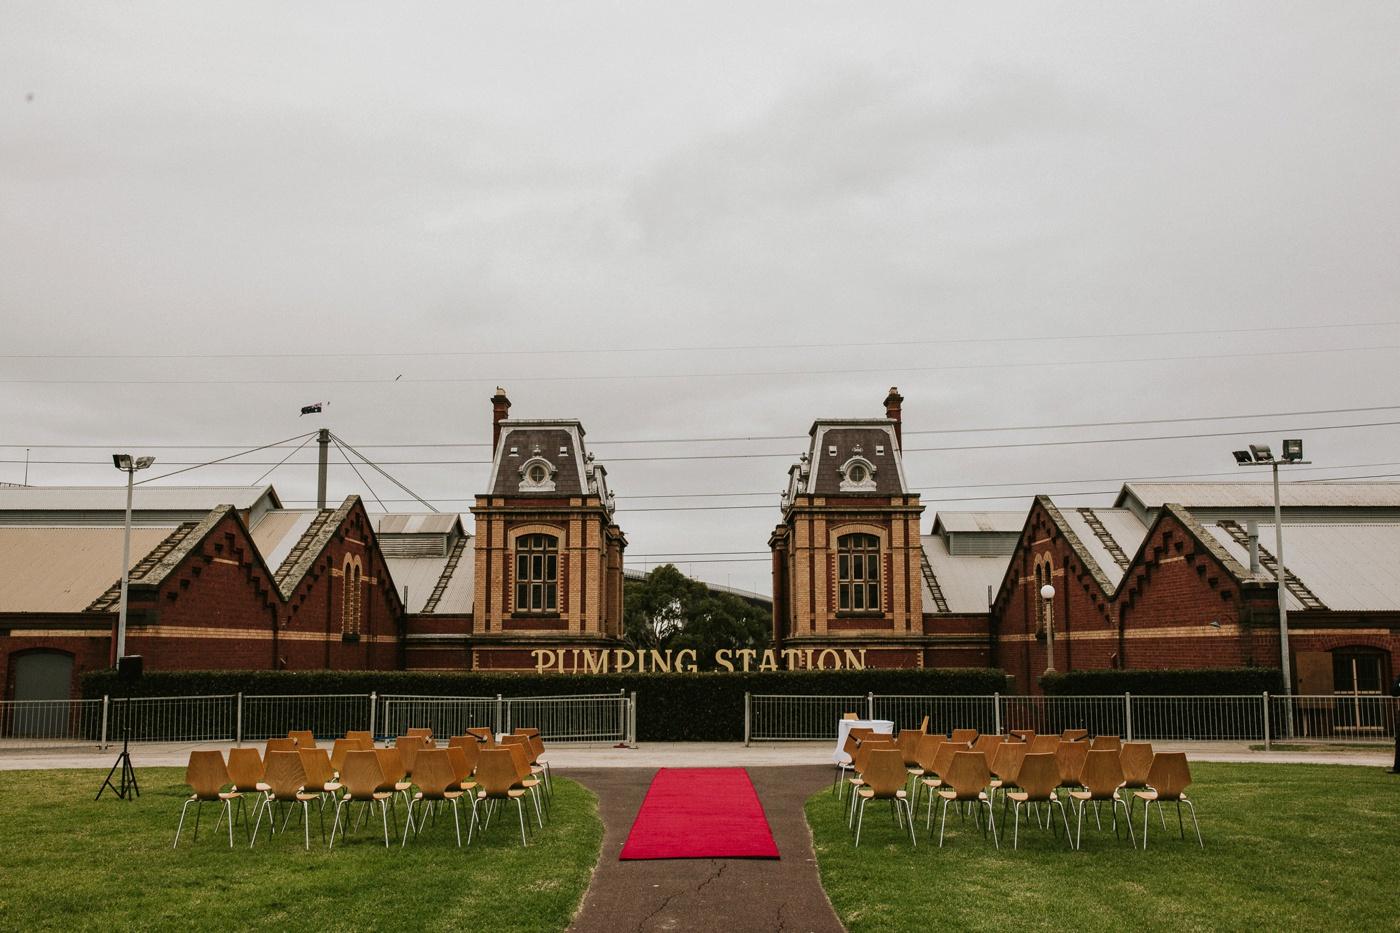 anitadaniel_melbourne-scienceworks-relaxed-fun-geek-wedding_melbourne-candid-wedding-photography_28